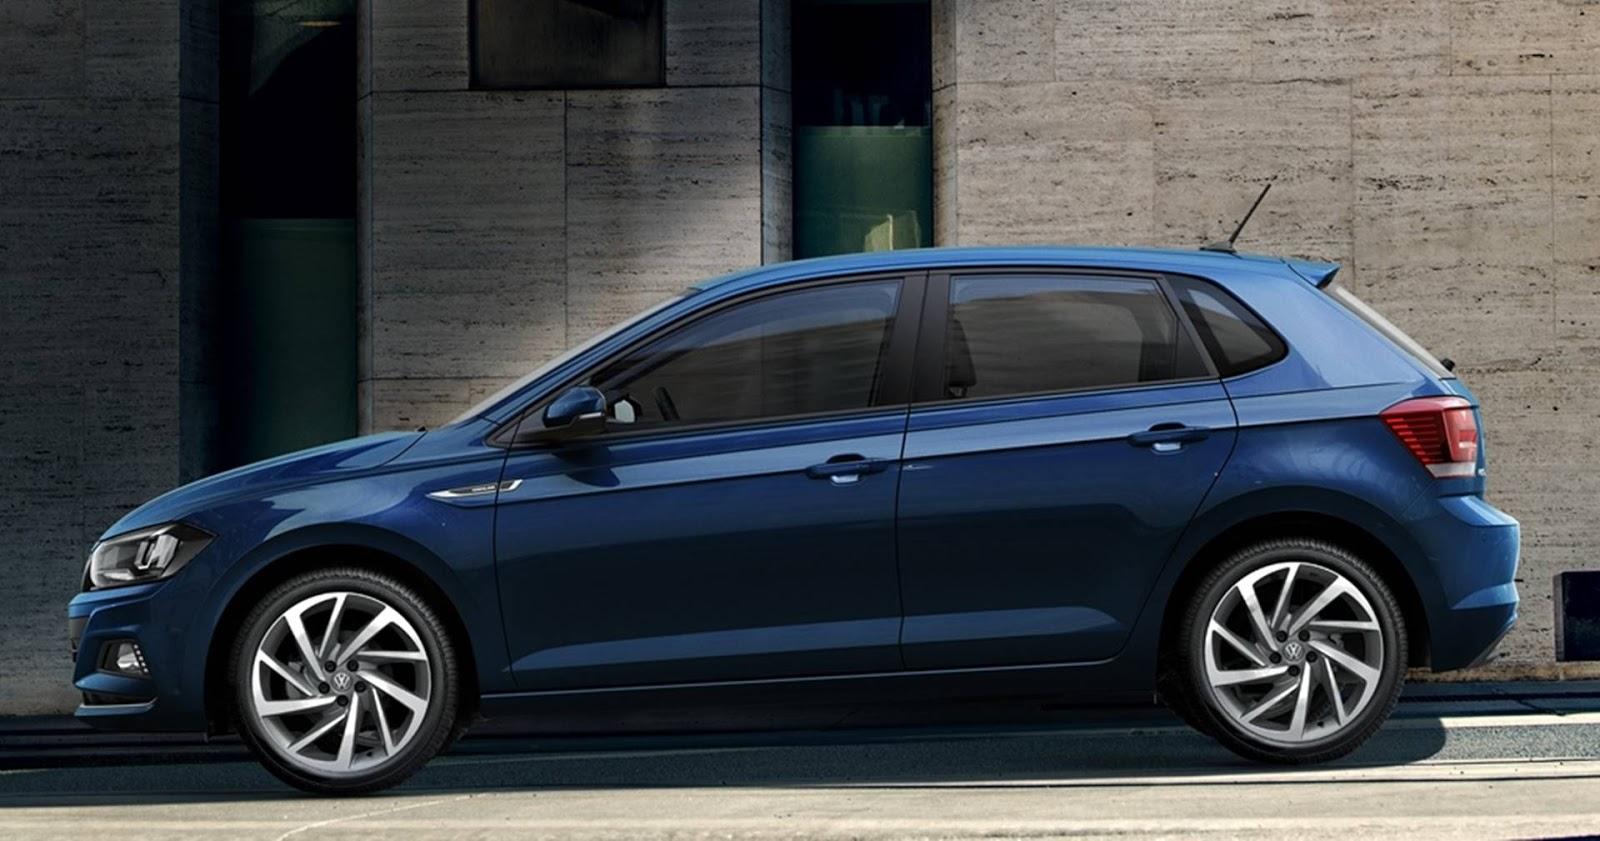 Corolla 2018 Top De Linha >> Polo brasileiro será vendido em 29 países - América Latina | CAR.BLOG.BR